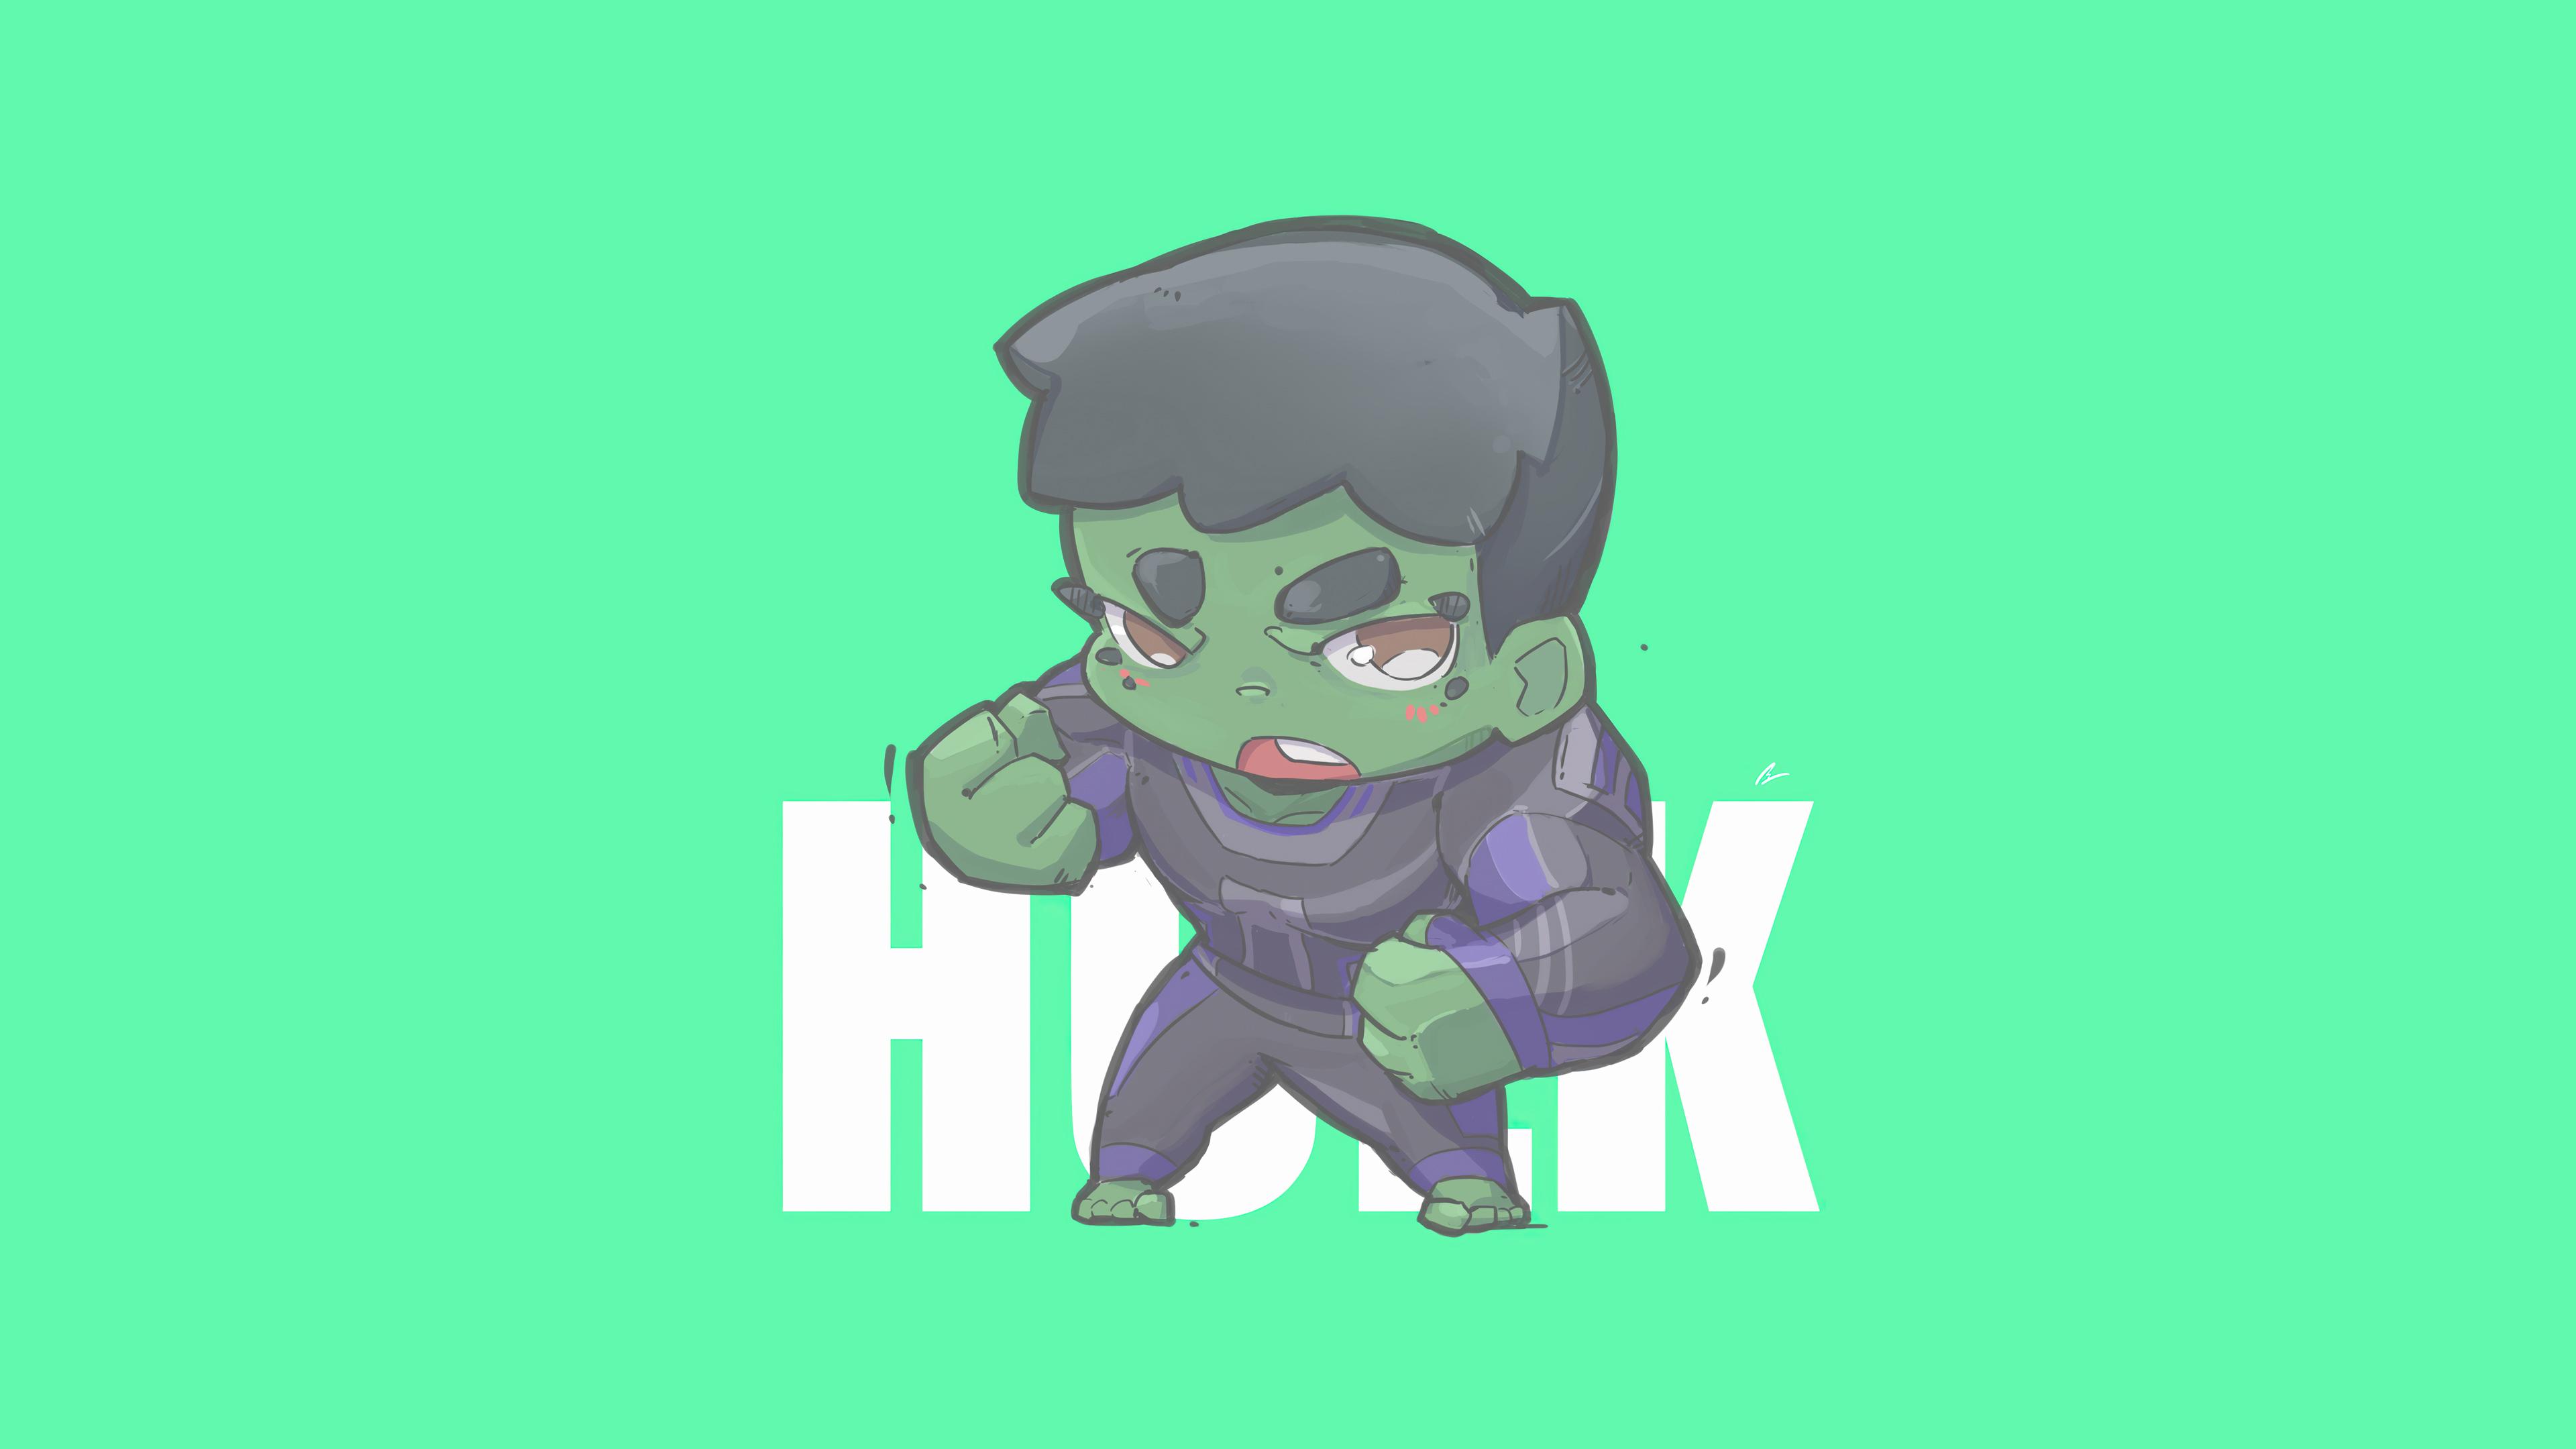 Fondos de pantalla Hulk Minimalista